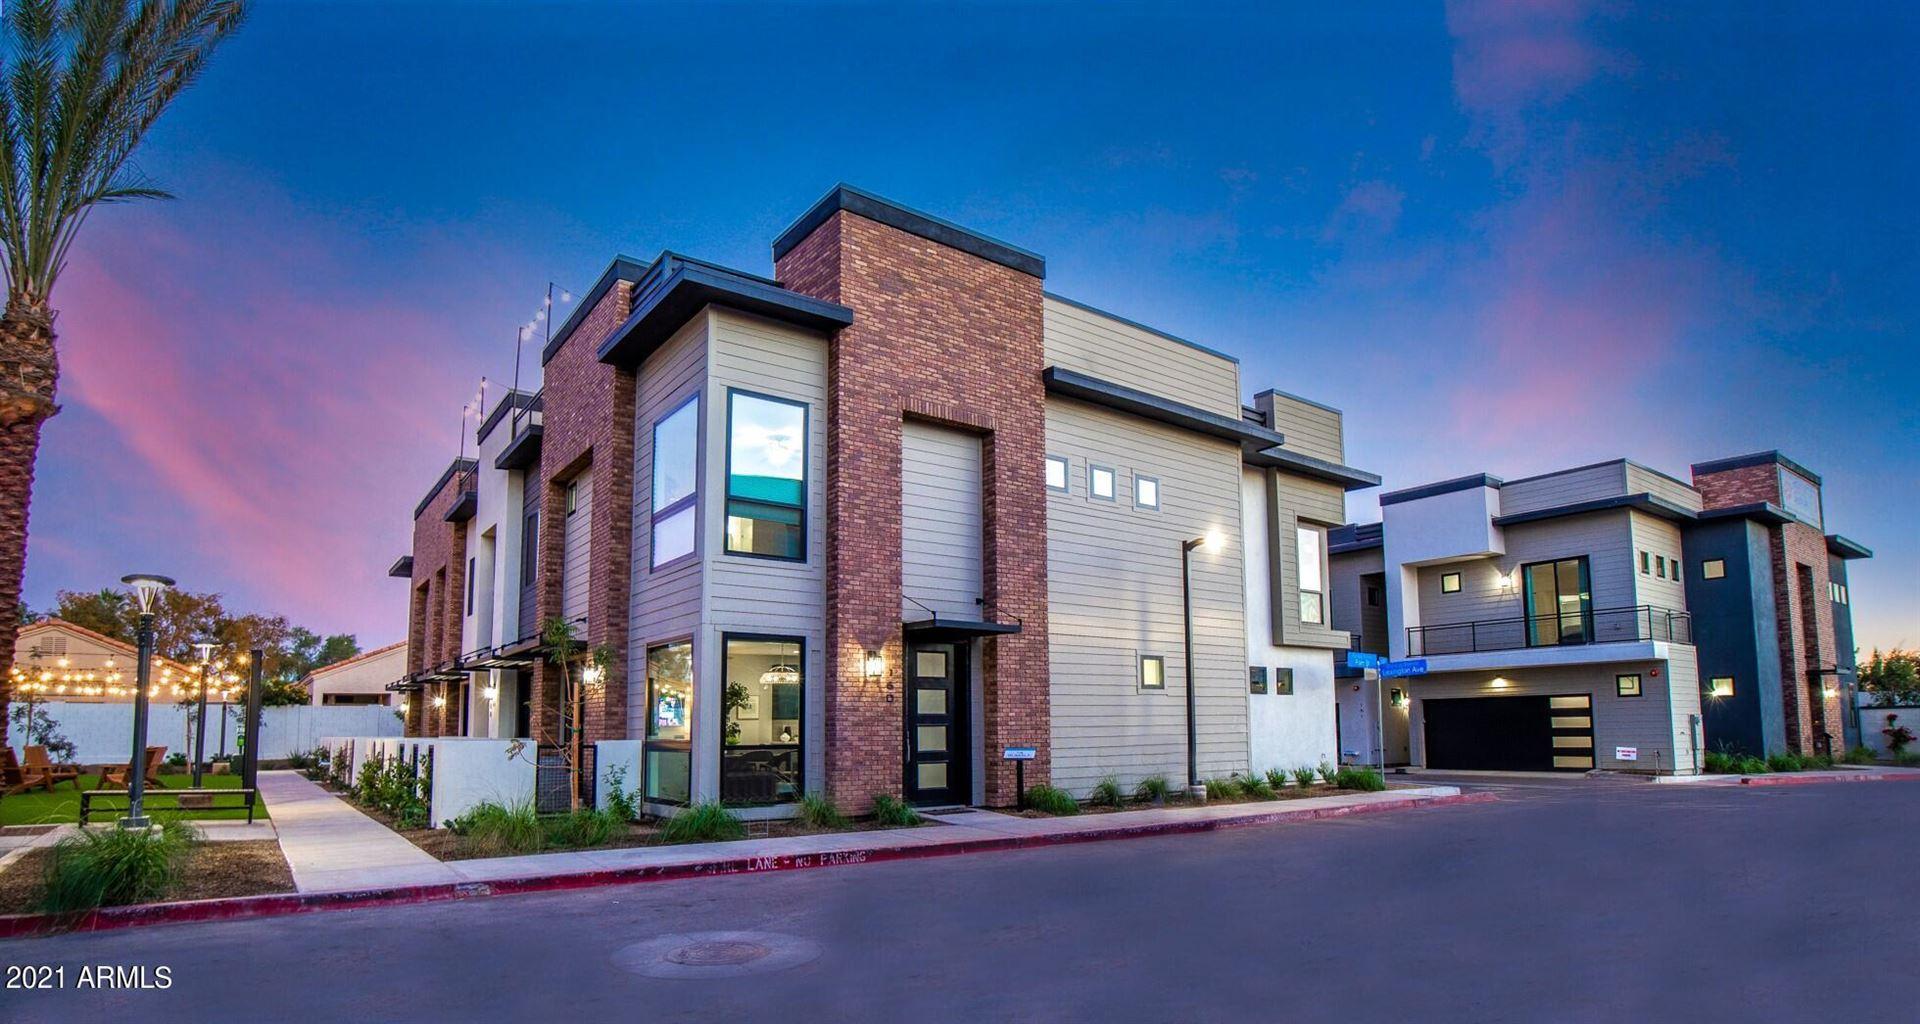 168 E LEXINGTON Avenue, Gilbert, AZ 85234 - MLS#: 6285399